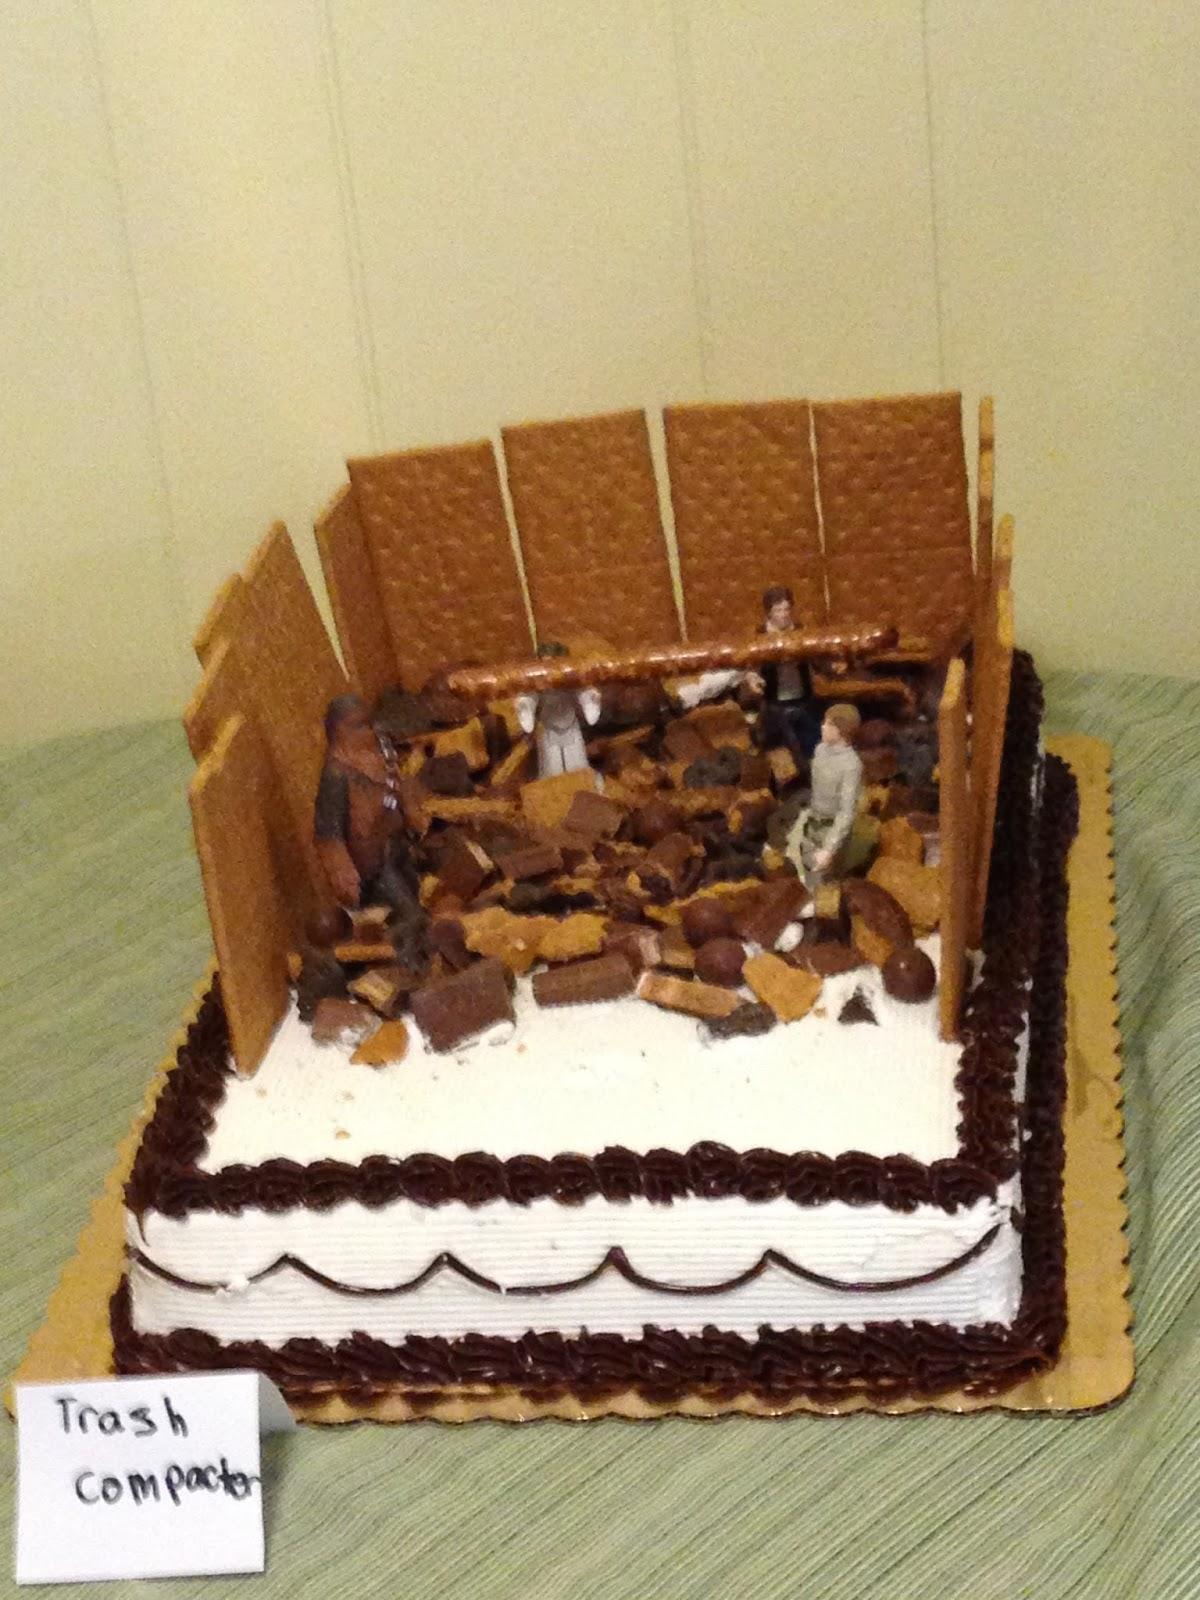 Trash Compactor Star Wars Cake